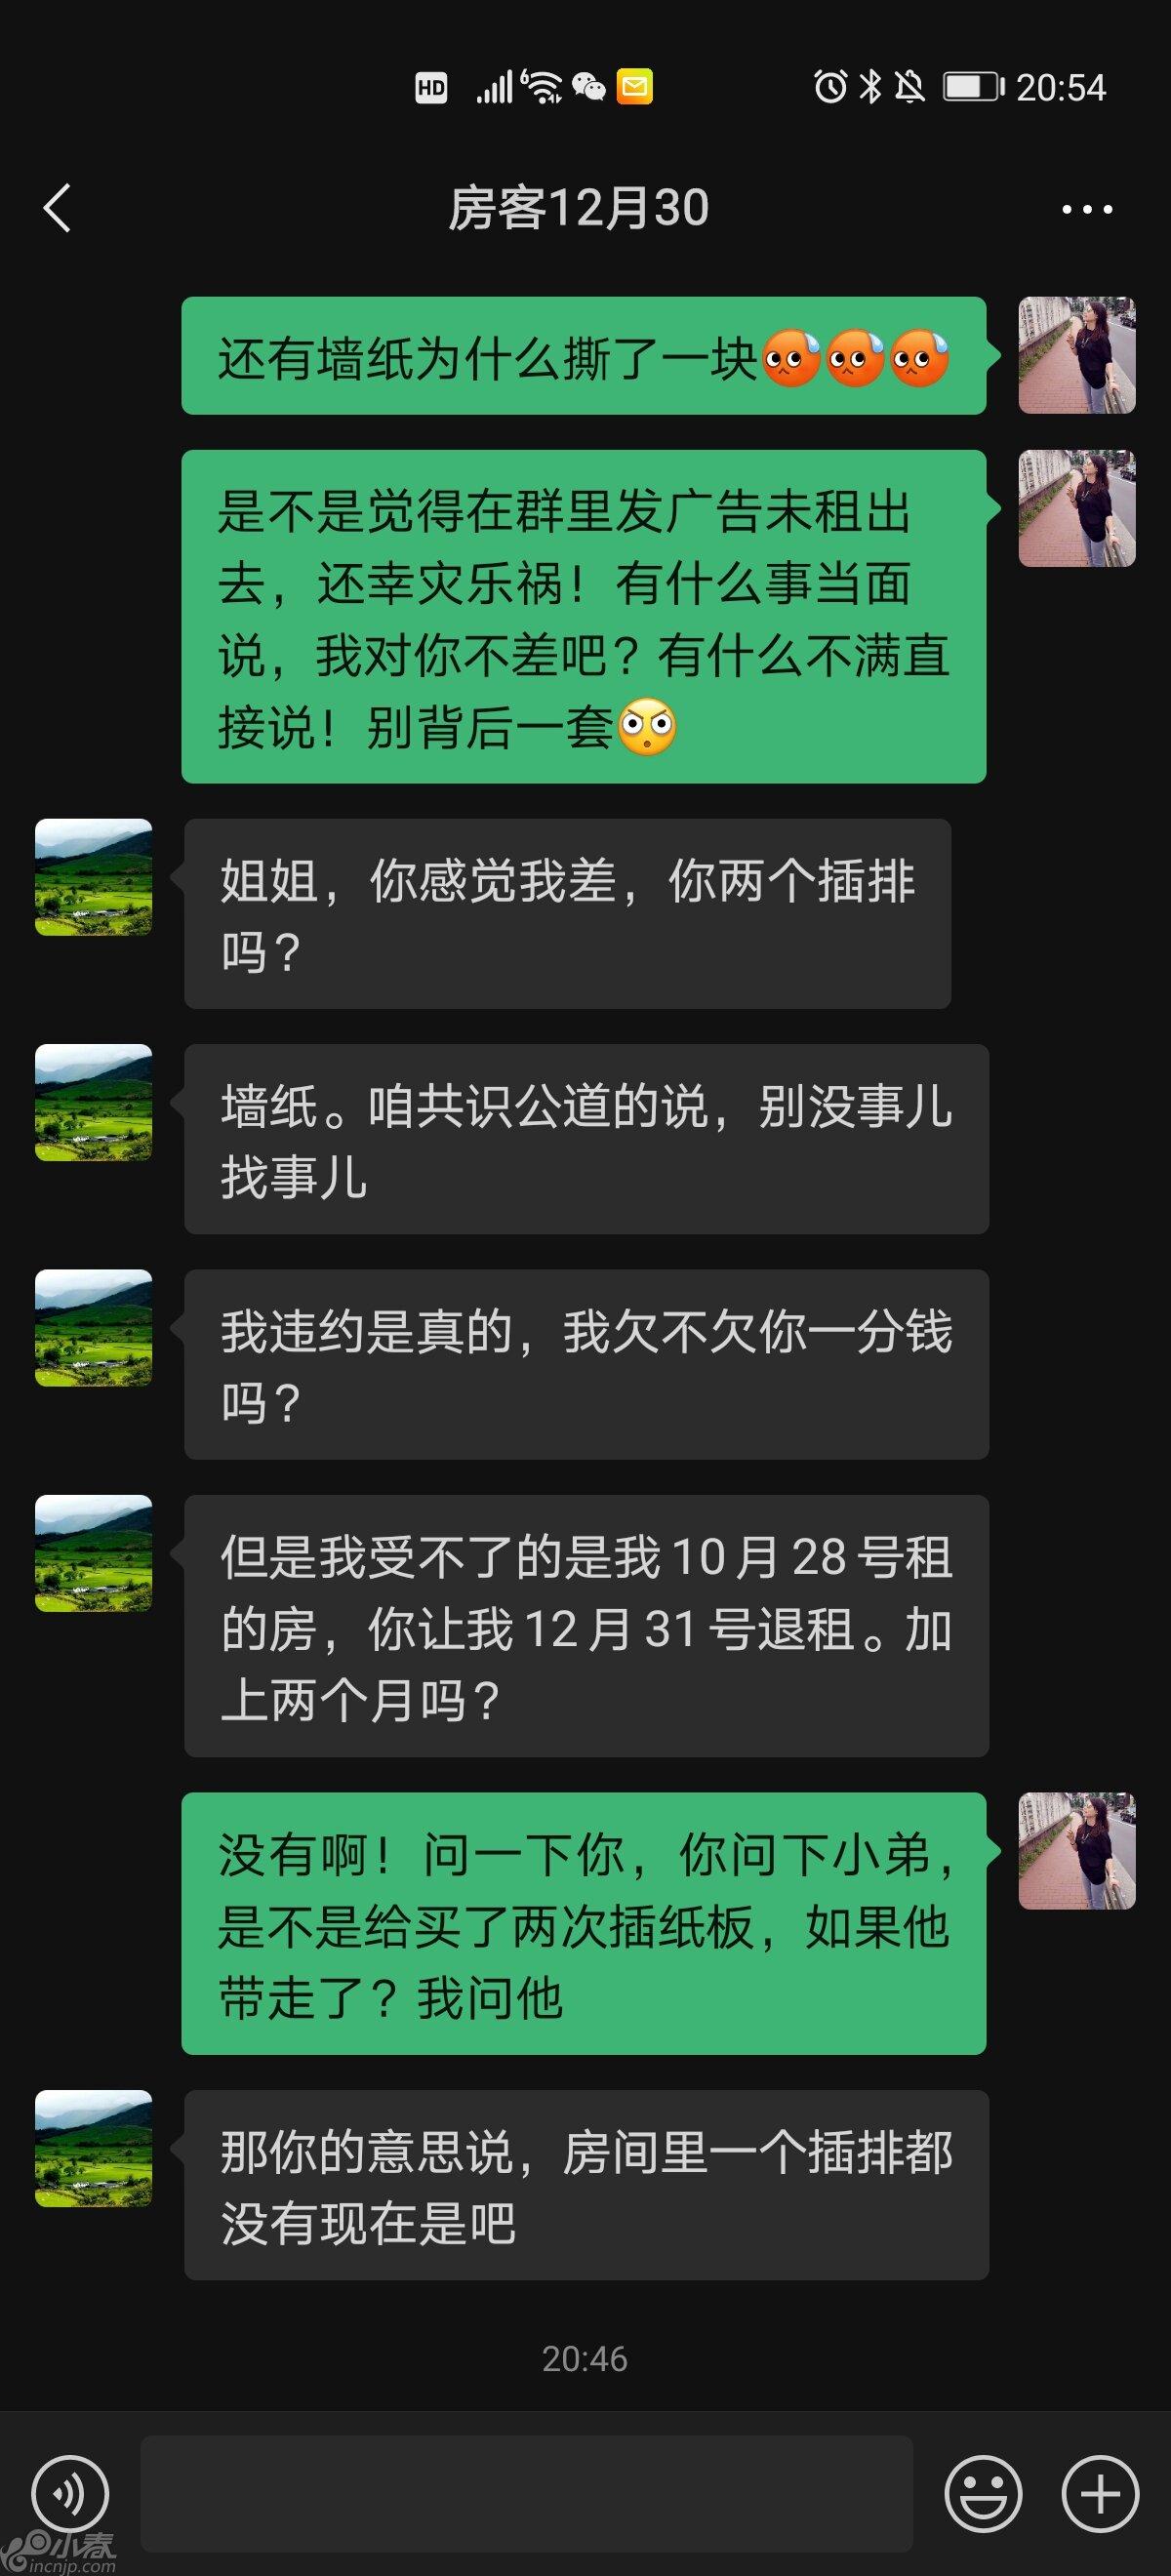 Screenshot_20210721_205409_com.tencent.mm.jpg